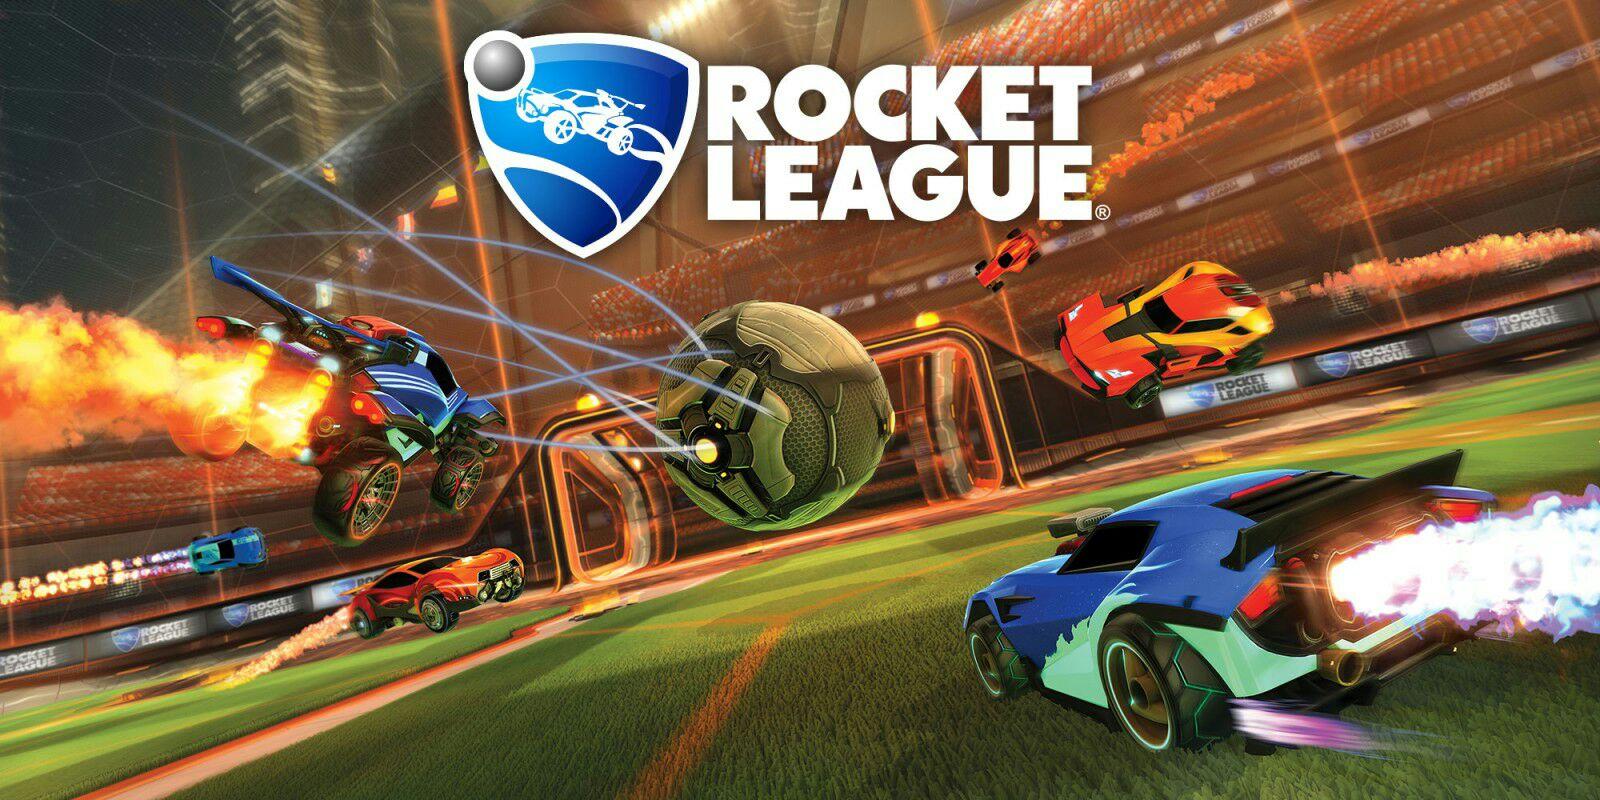 Rocket League - Nintendo Switch - UK eShop £7.50 (50% off)